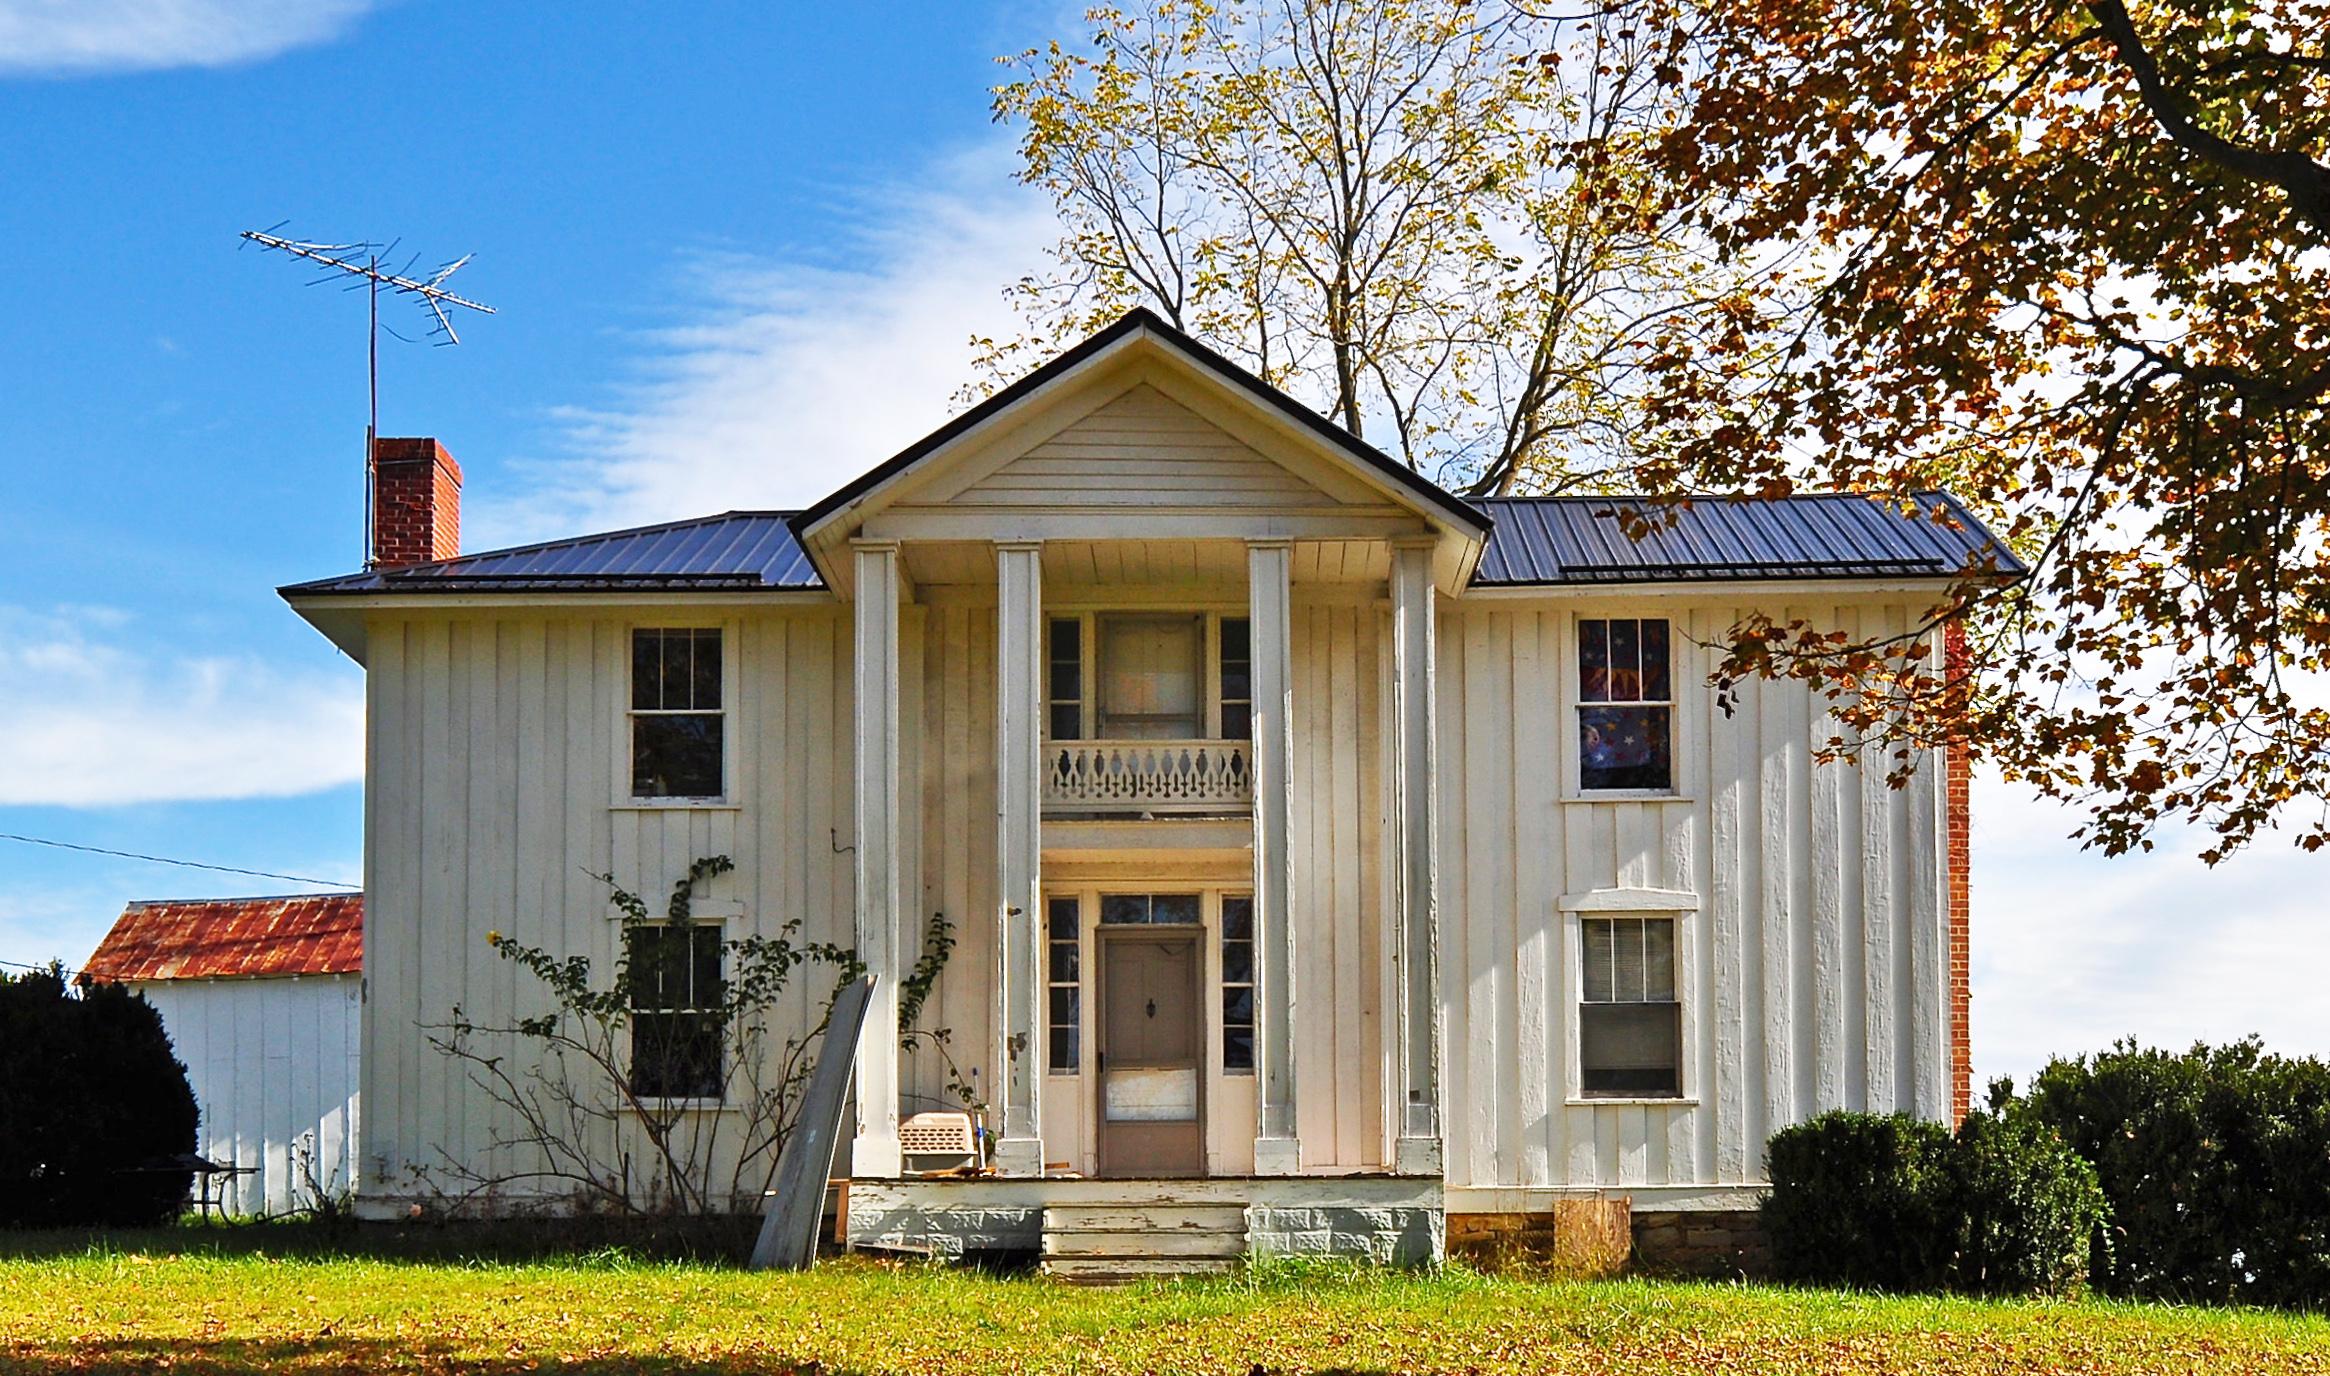 Thomas Hall House